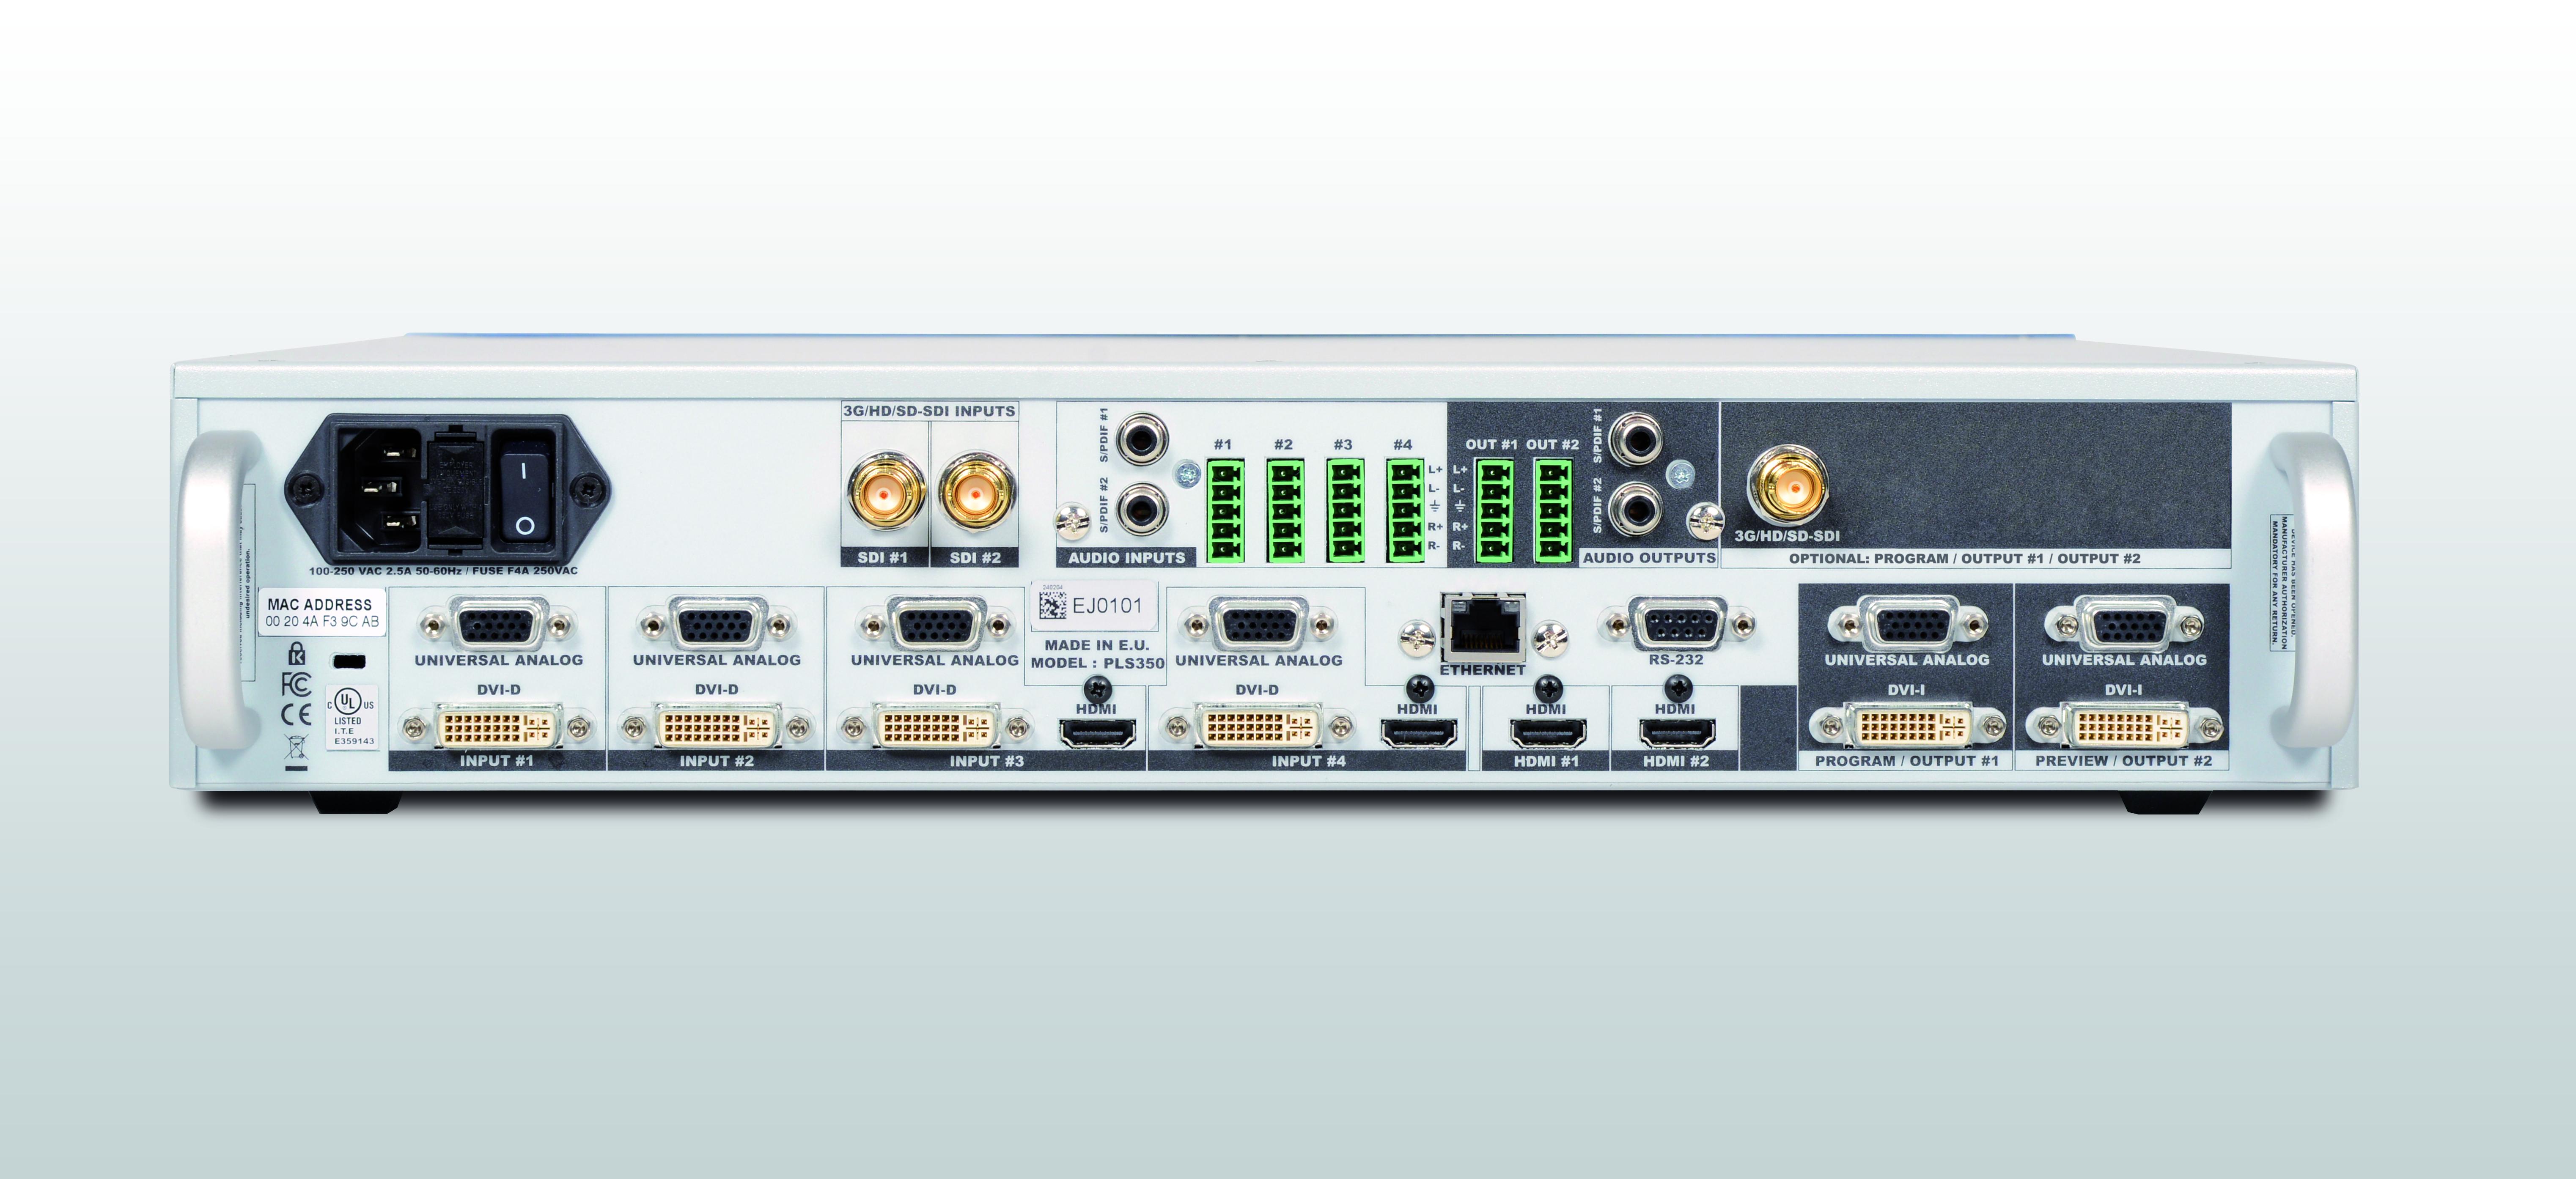 Pulse 3g Midra 3 Way Video Switch Box Pls350 Rear Panel Picture 2015 09 22